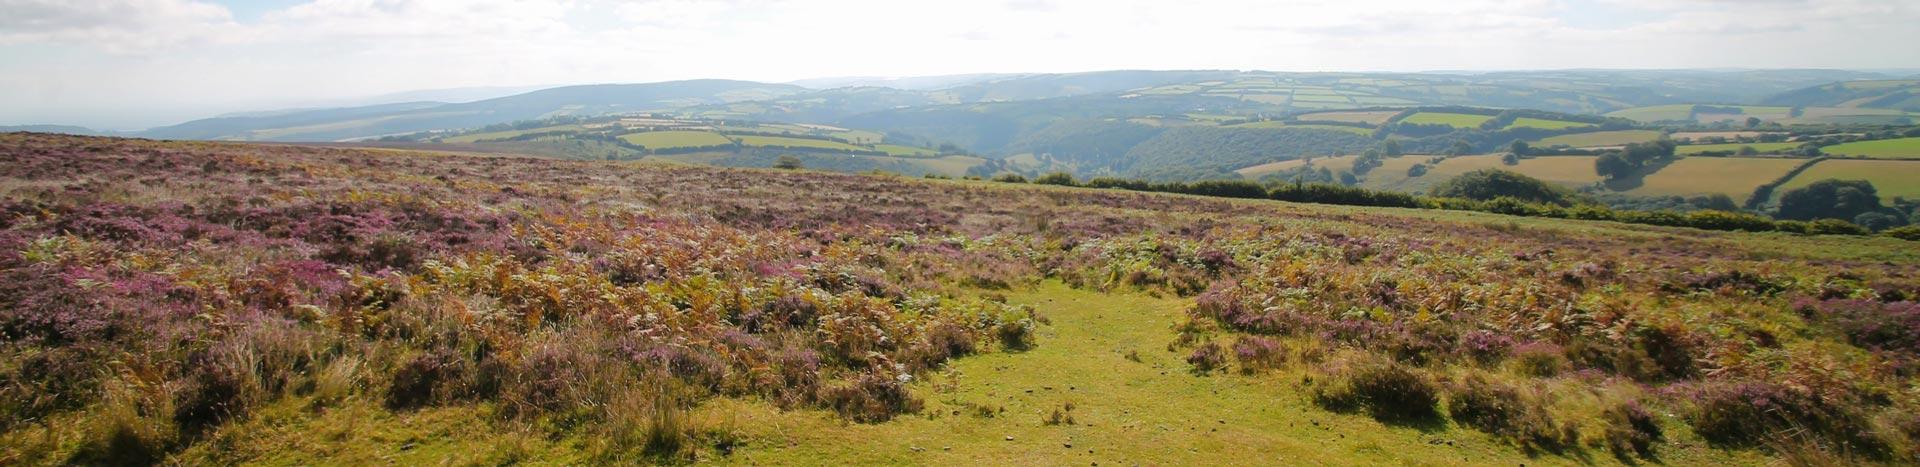 Exmoor moorland